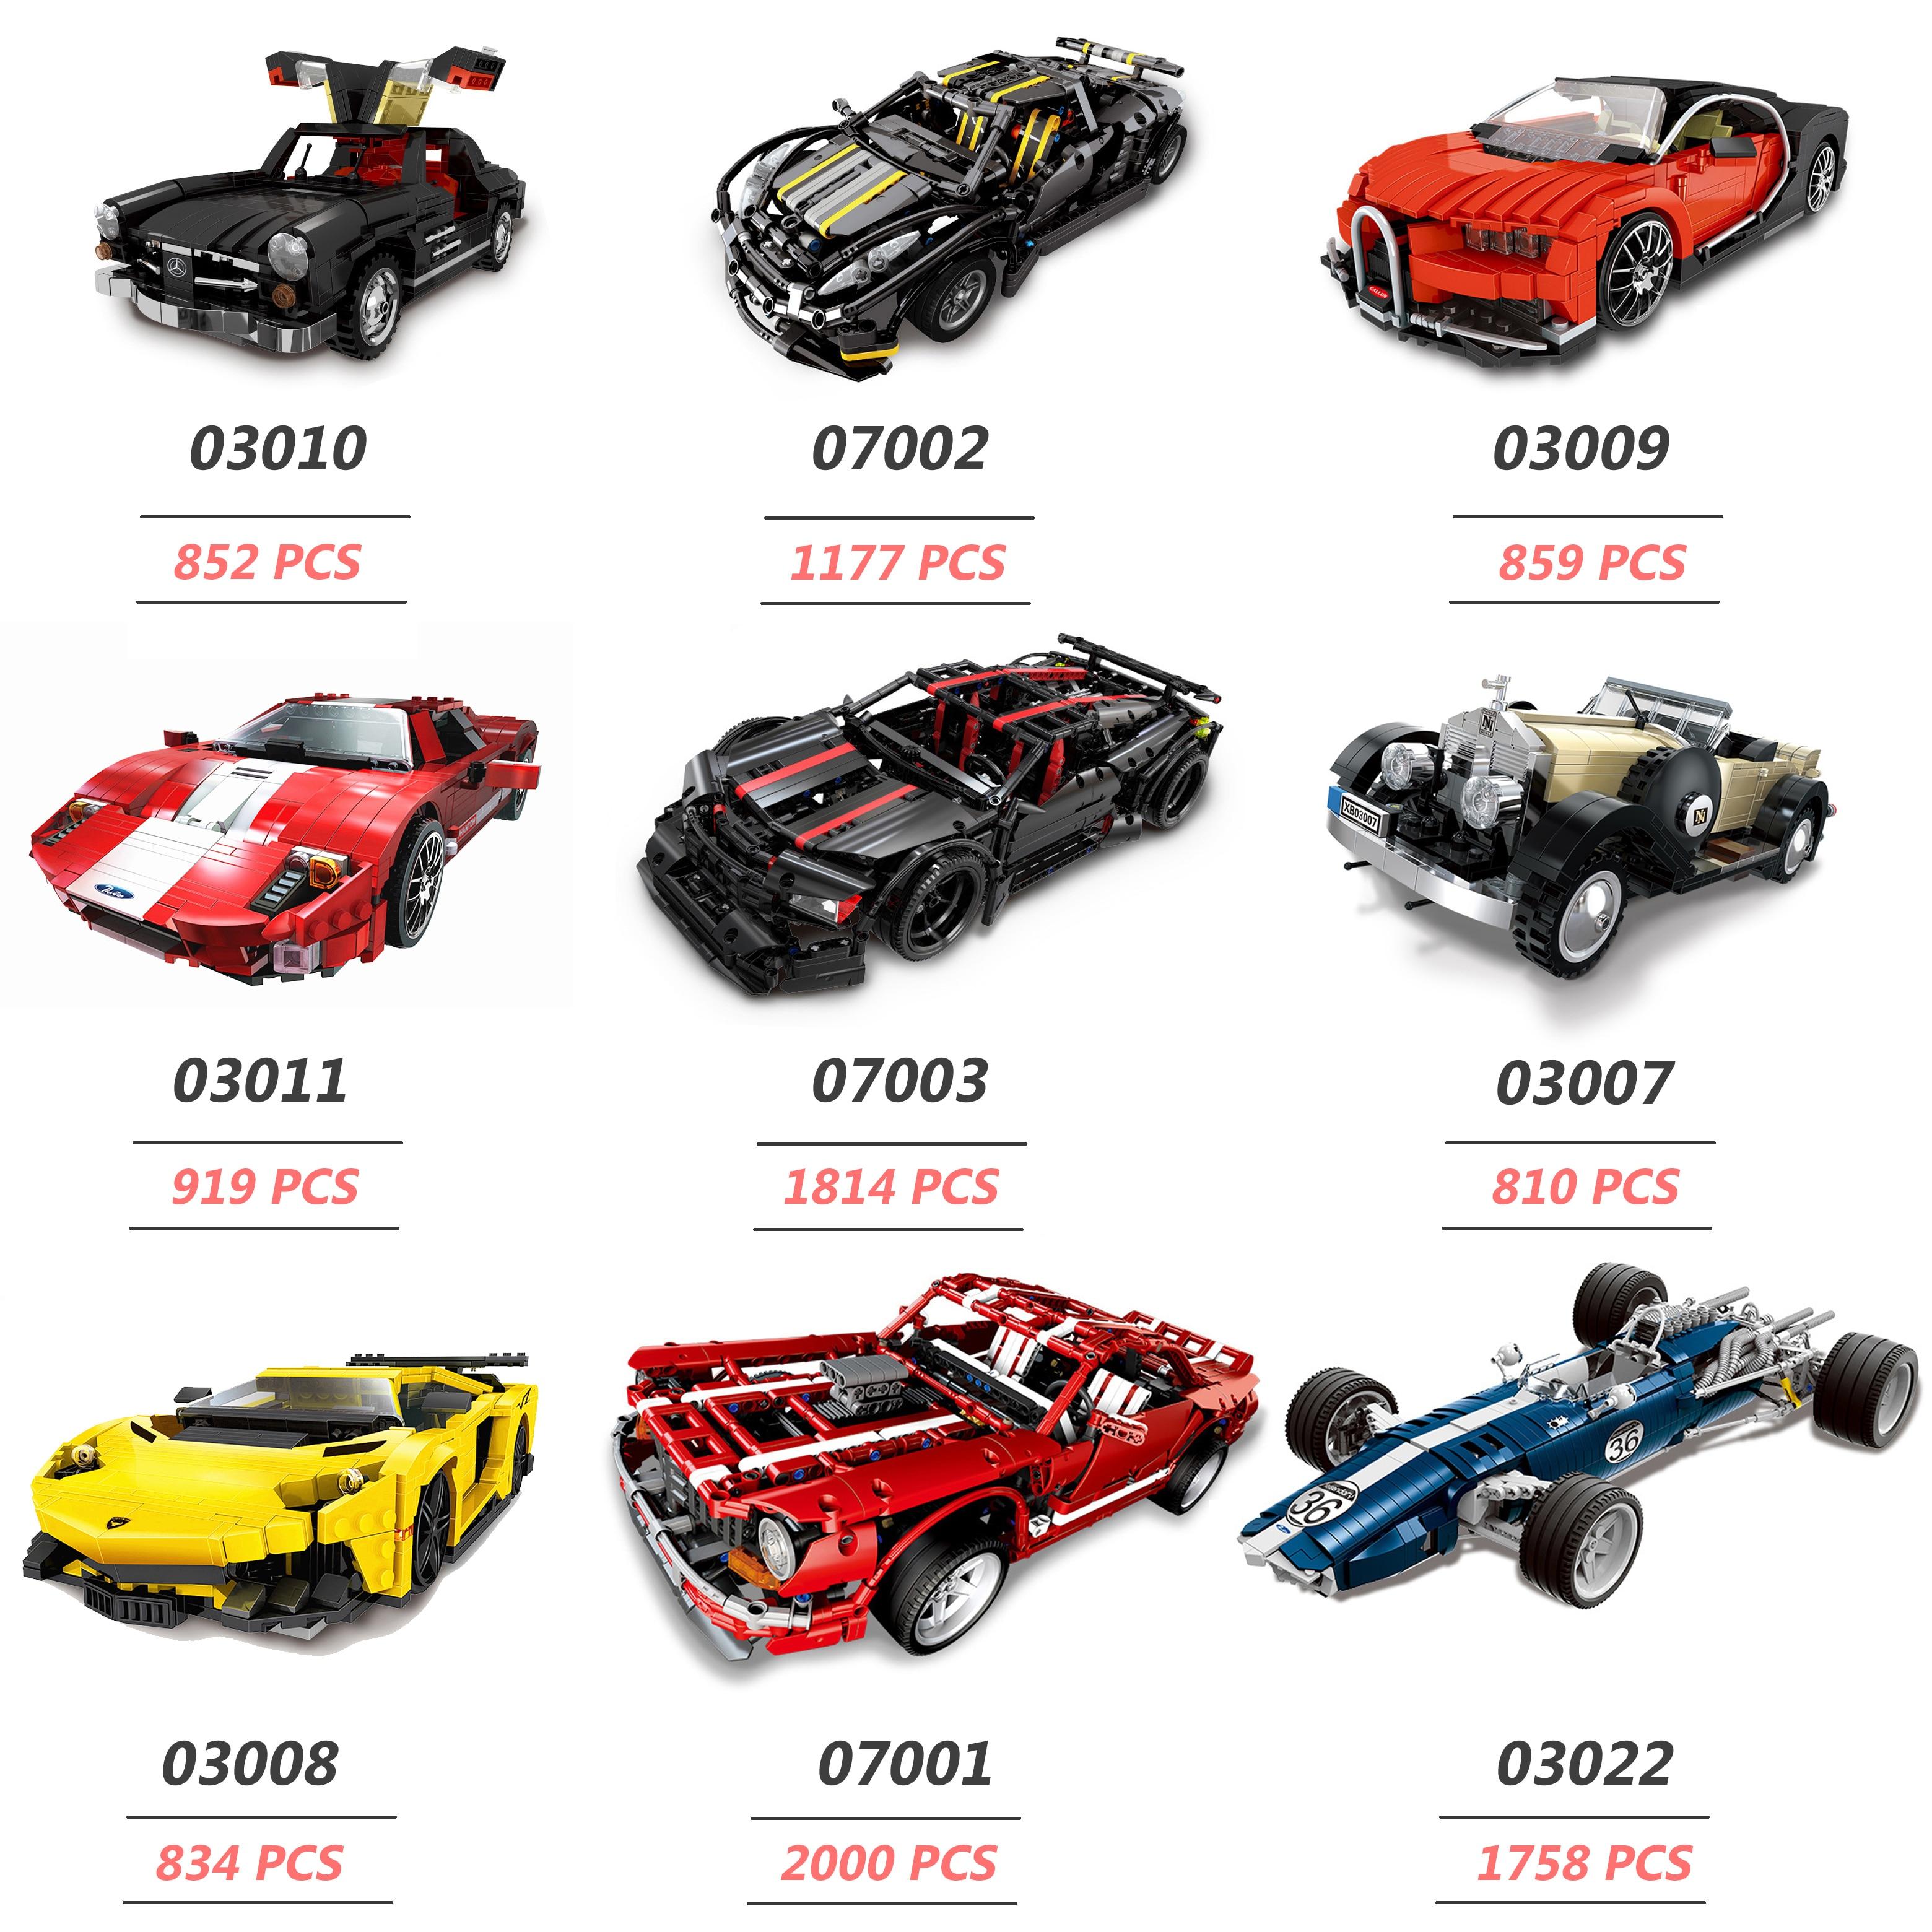 XINGBAO NEW TECHNIC Car Series 03022 03008 07003 The Noble Racing Car Sets Building Blocks MOC